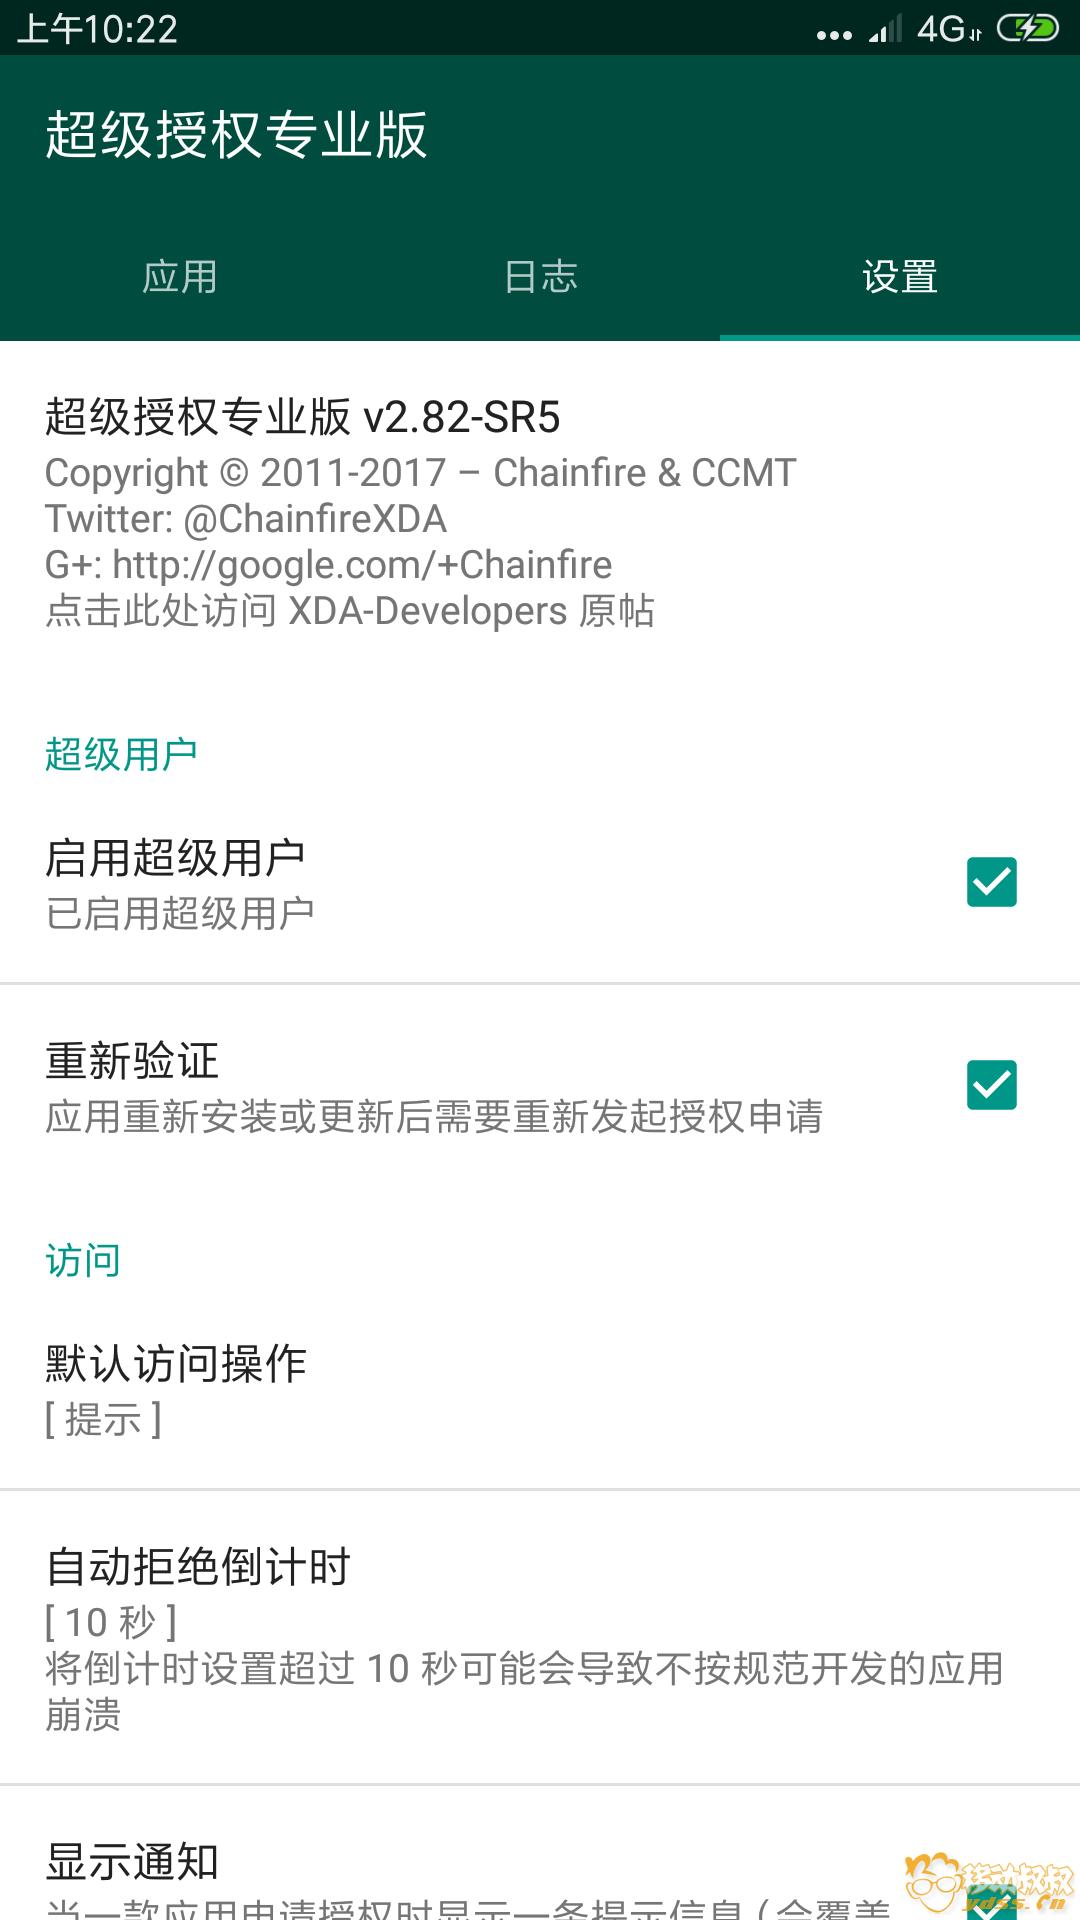 Screenshot_2018-07-04-10-22-24-782_eu.chainfire.supersu.png